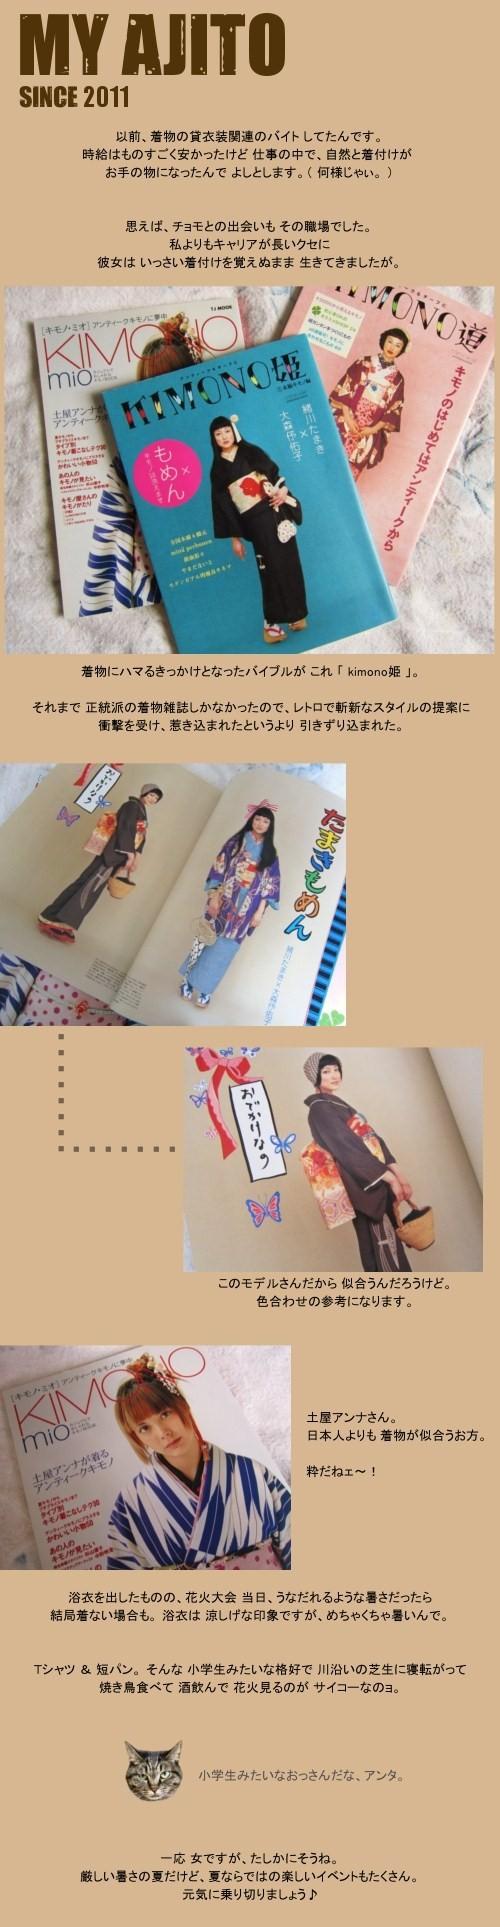 natsu_item_5.jpg